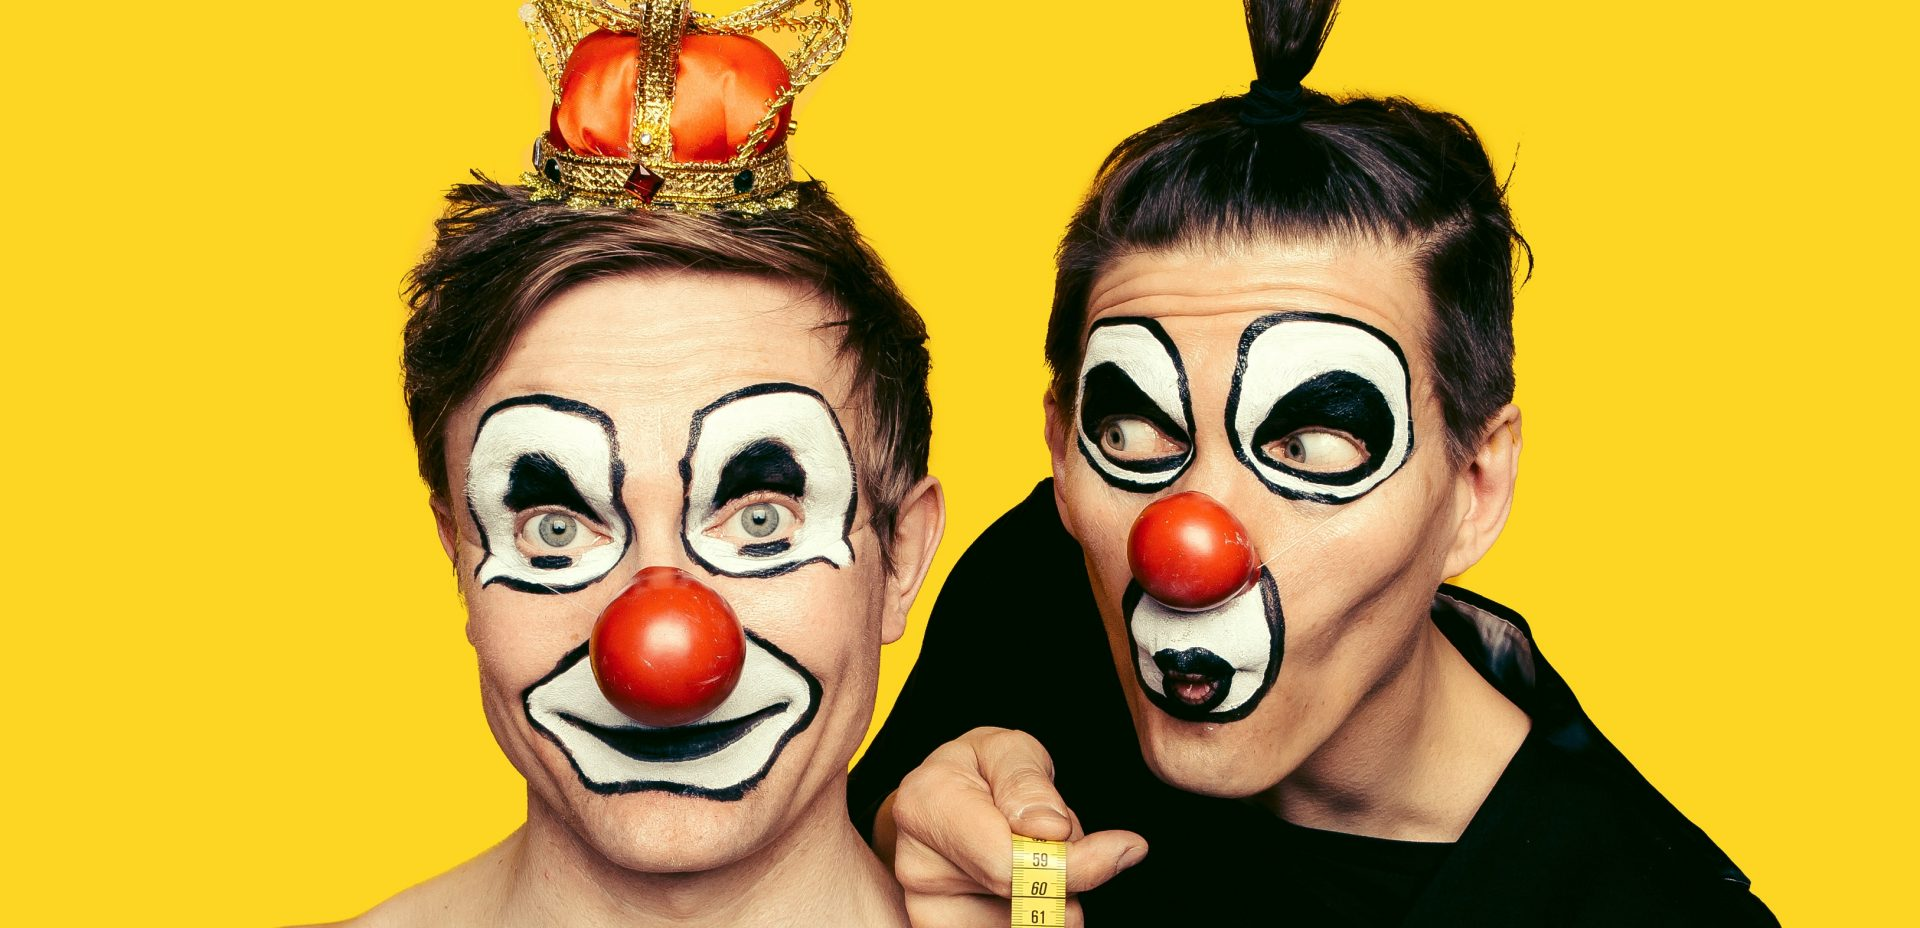 Red Nose Company, kuva: Tero Ahonen